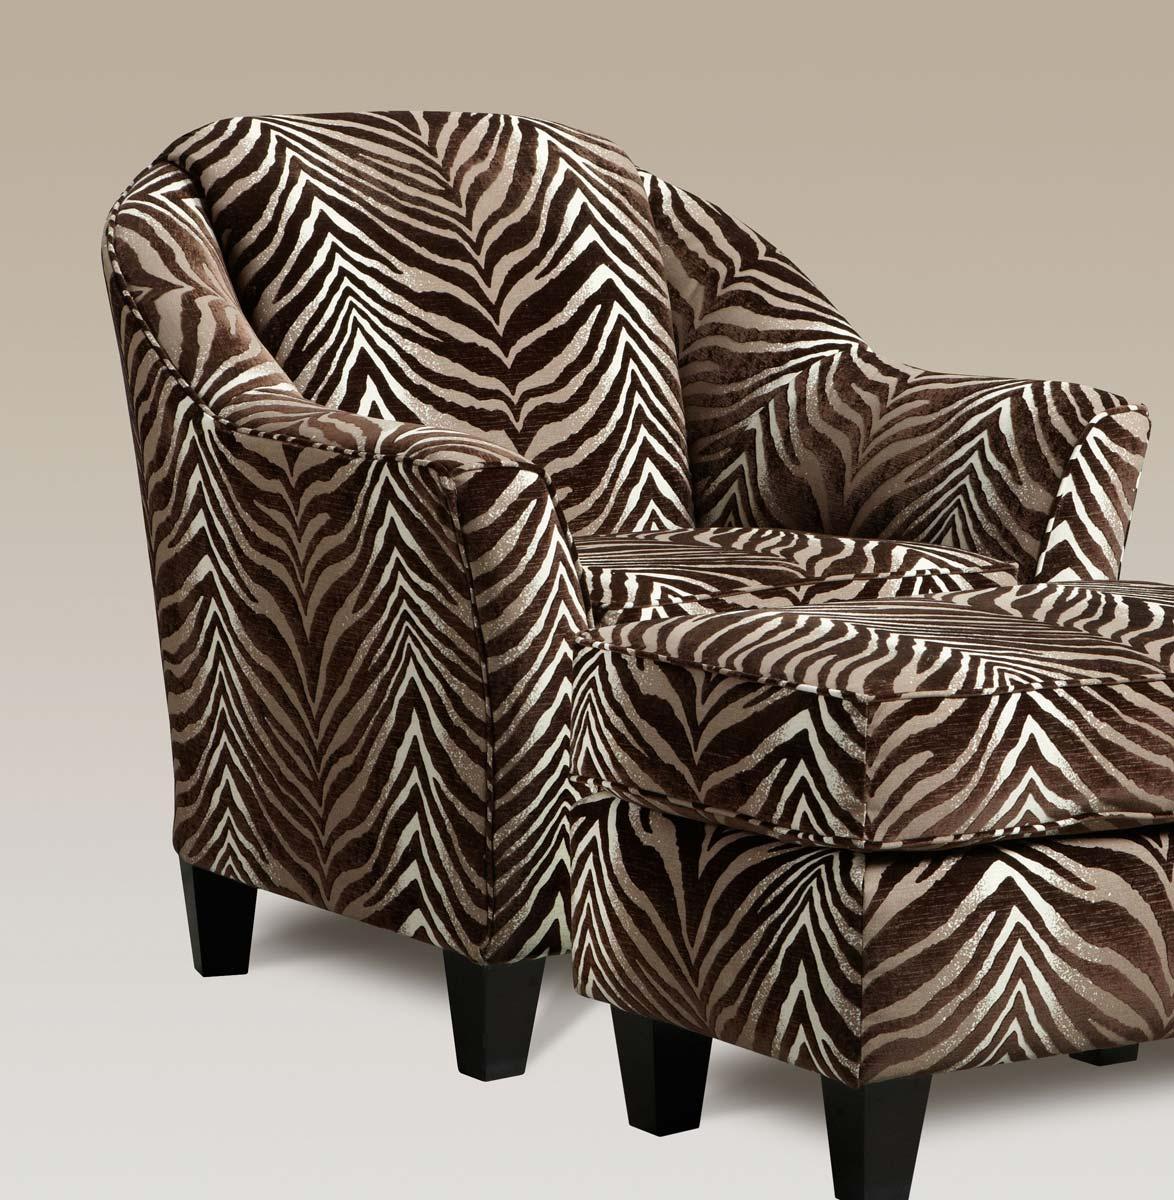 Chelsea Home Mercer Accent Chair - Shaman Linen - Chelsea